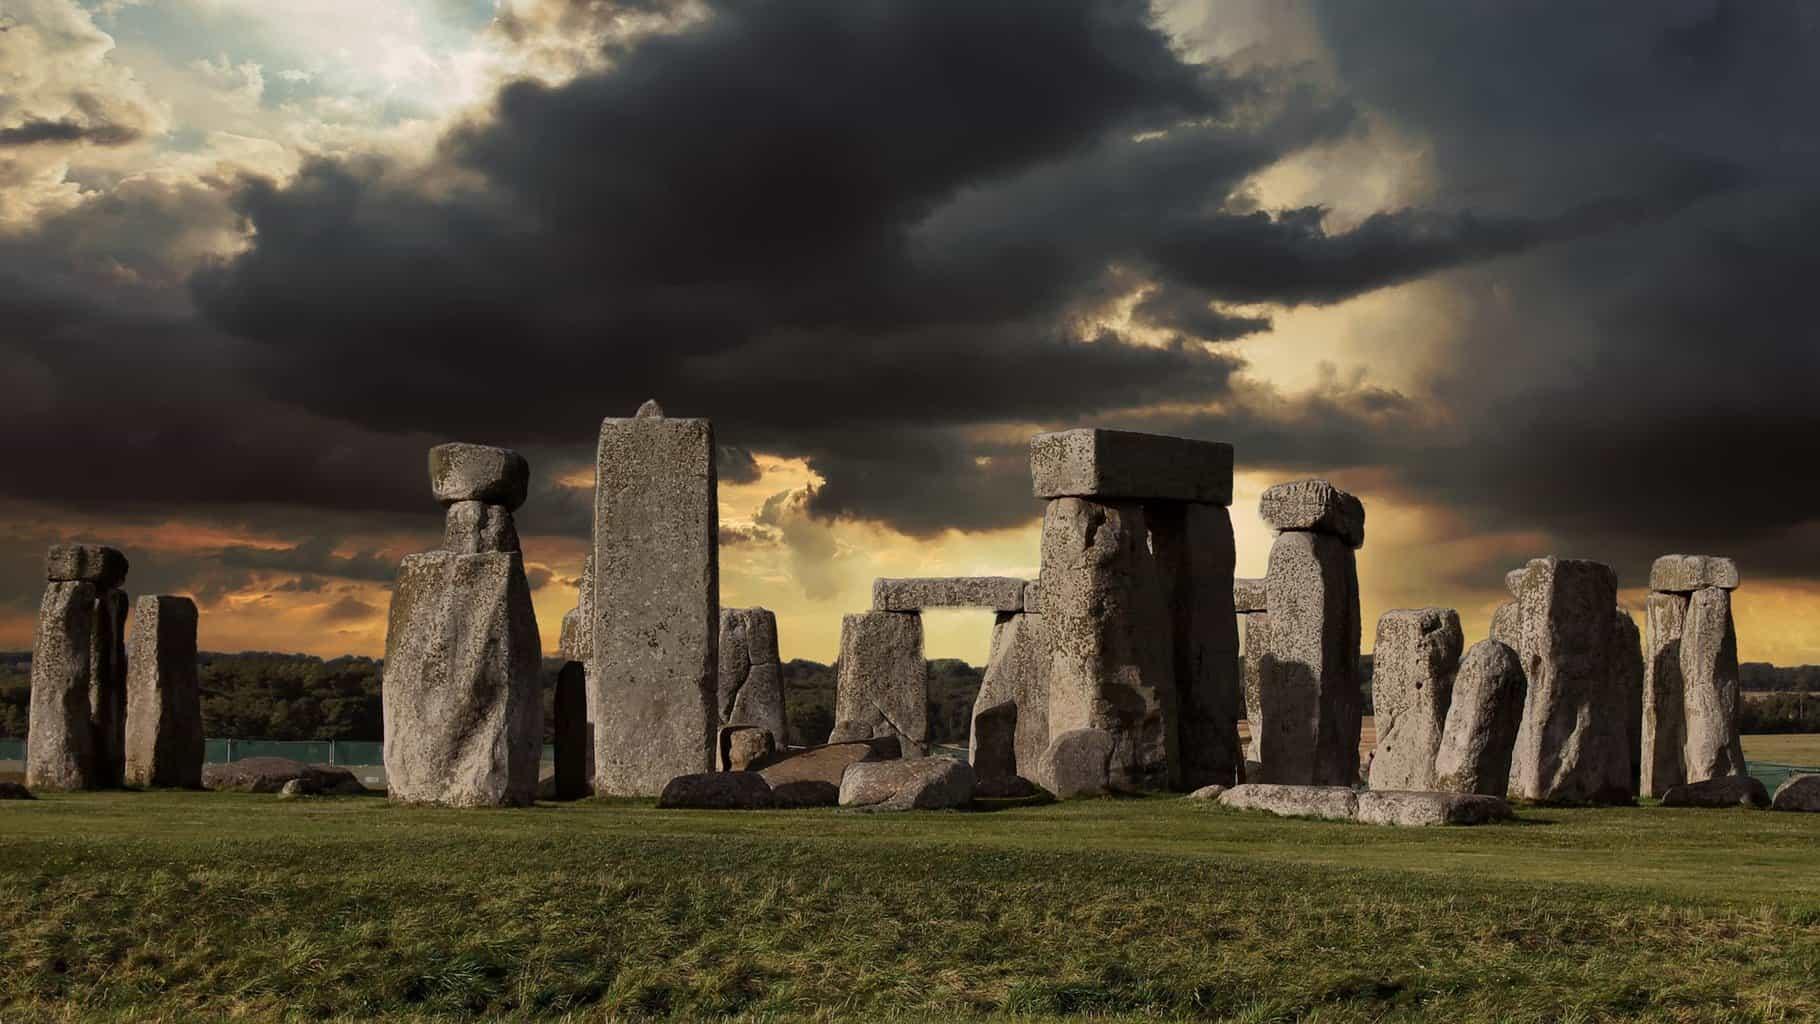 Stonehenge under a dramatic sky.